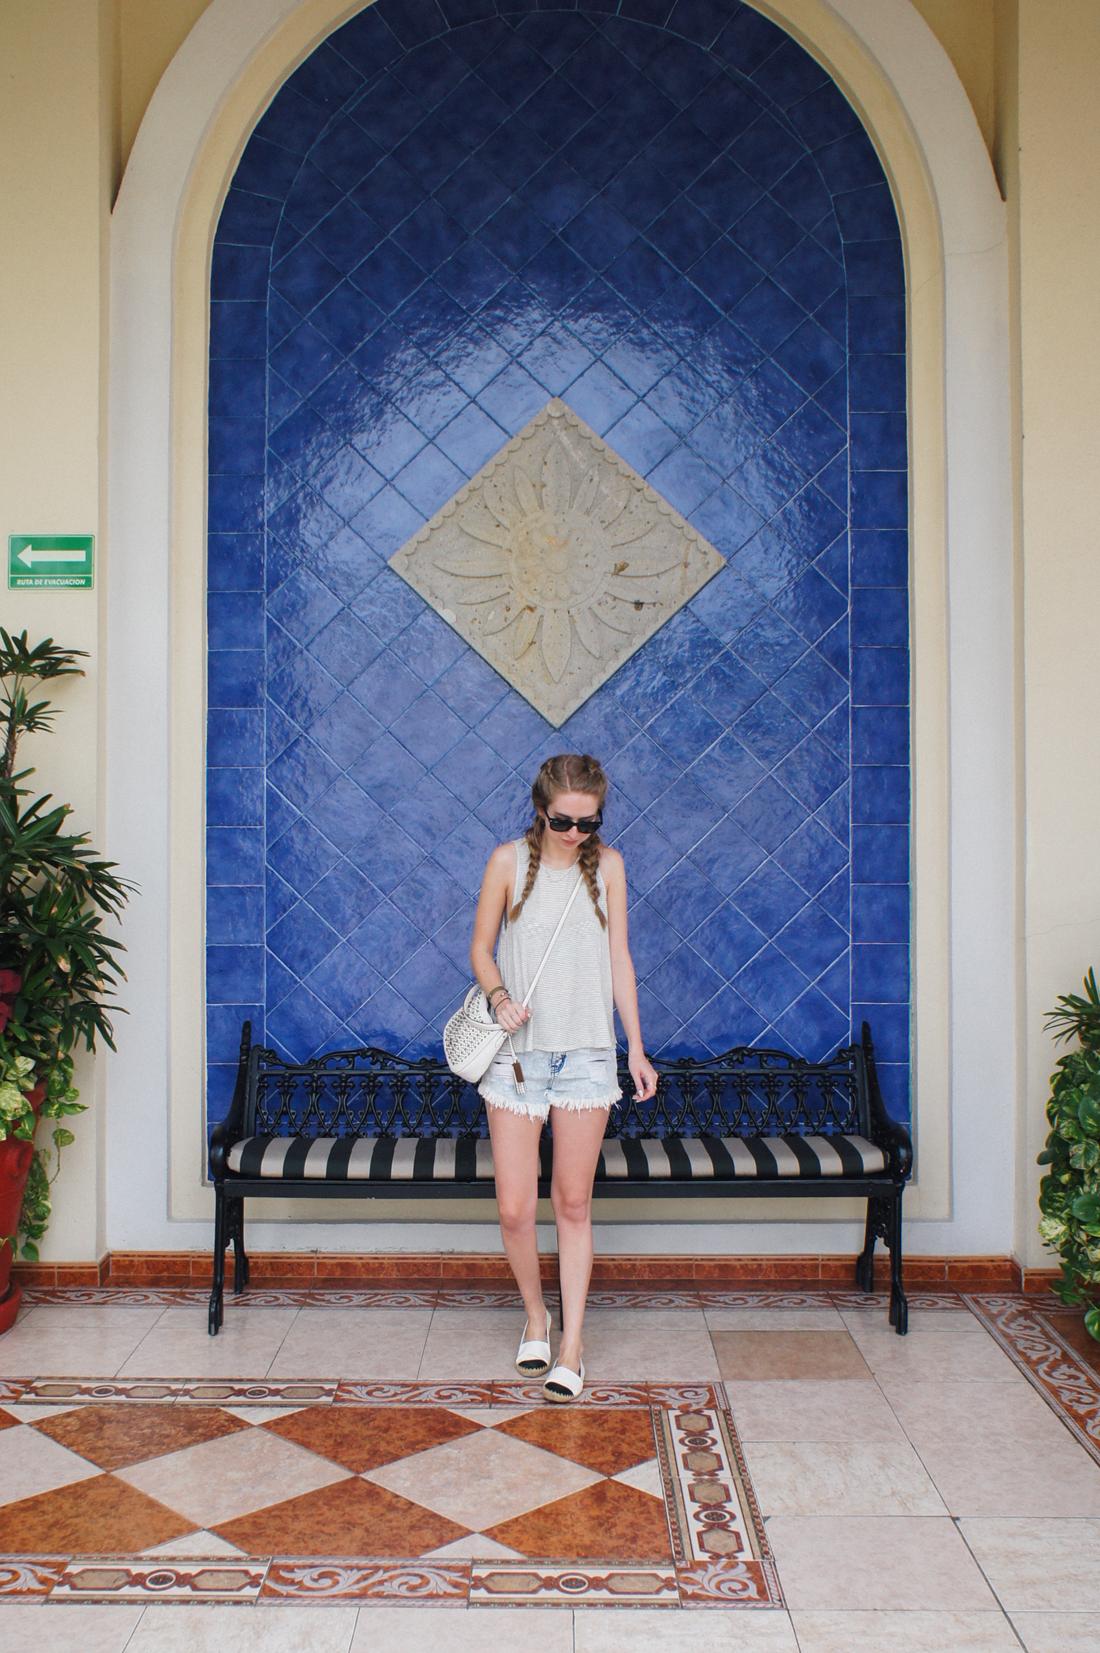 Home Sweet Hotel: The Riu Palace | truelane